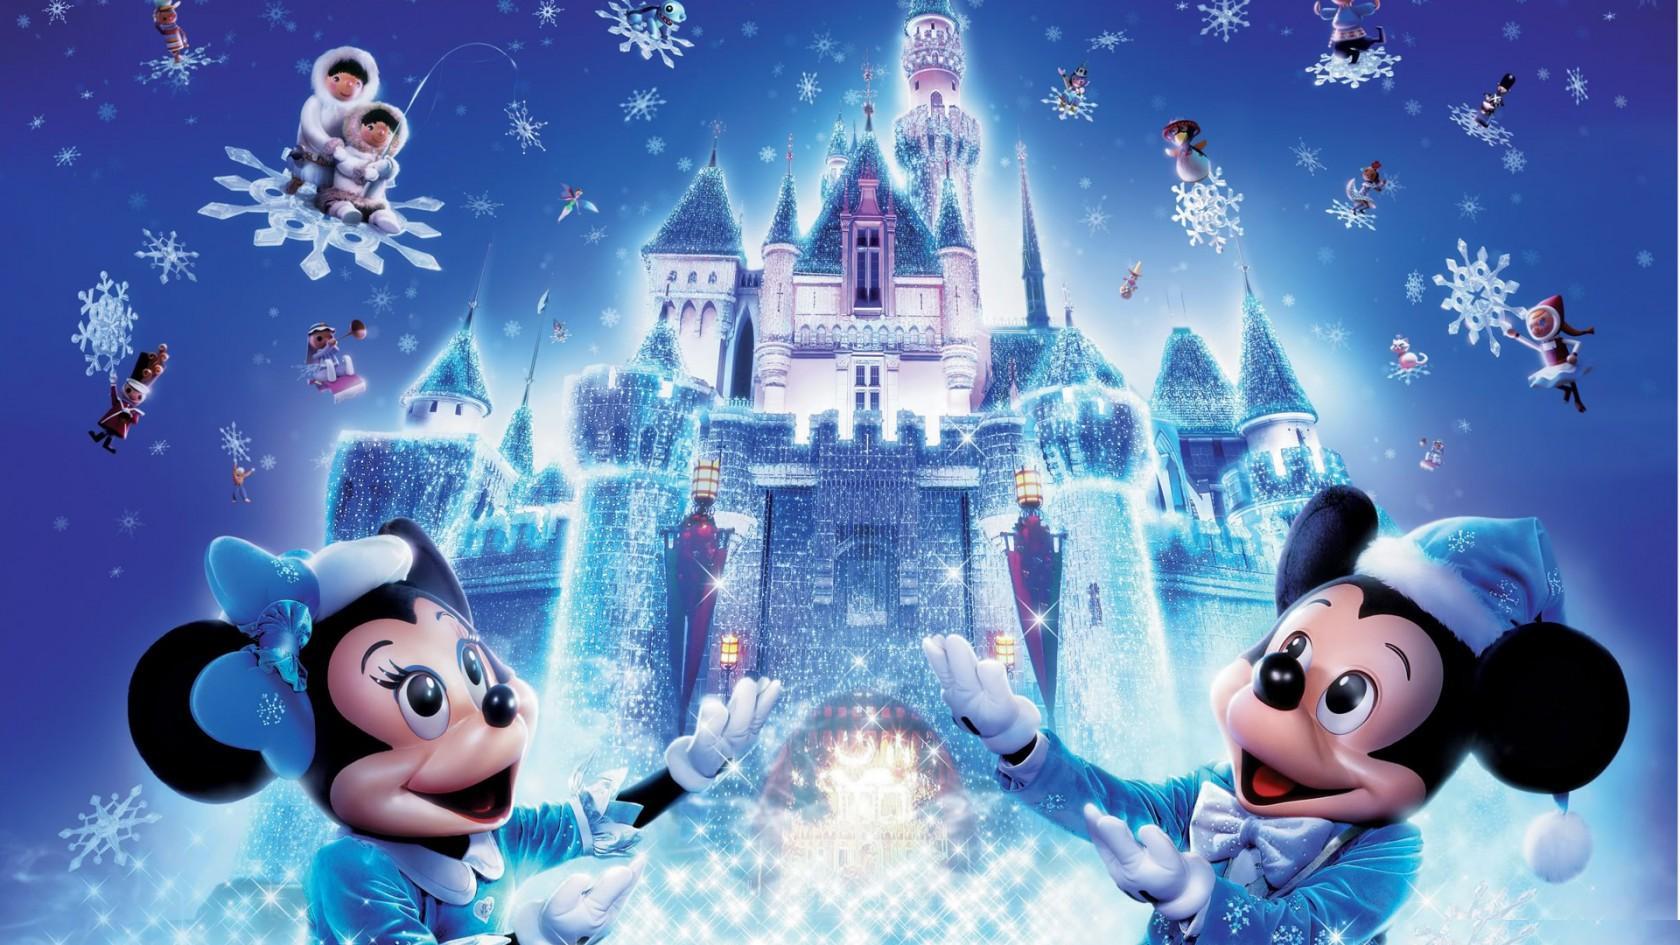 Wallpapers For Desktop Christmas Frozen HD 1680x945